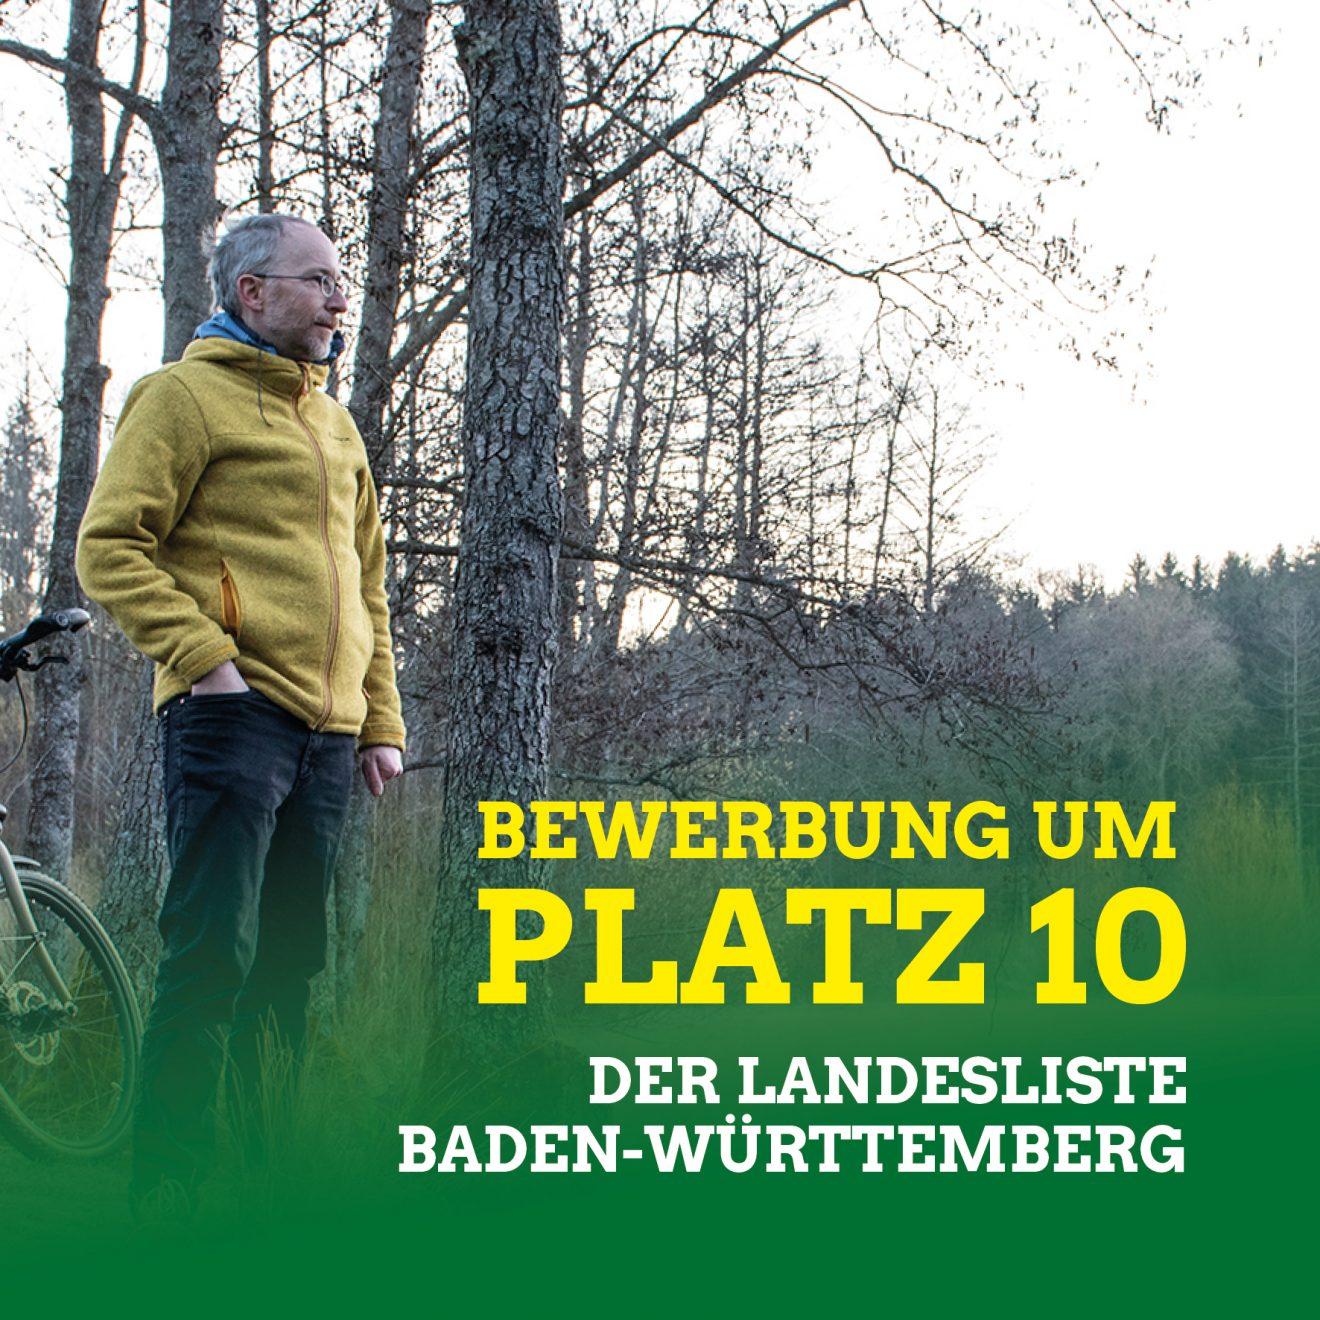 Sharepic_bewerbung_Landesliste